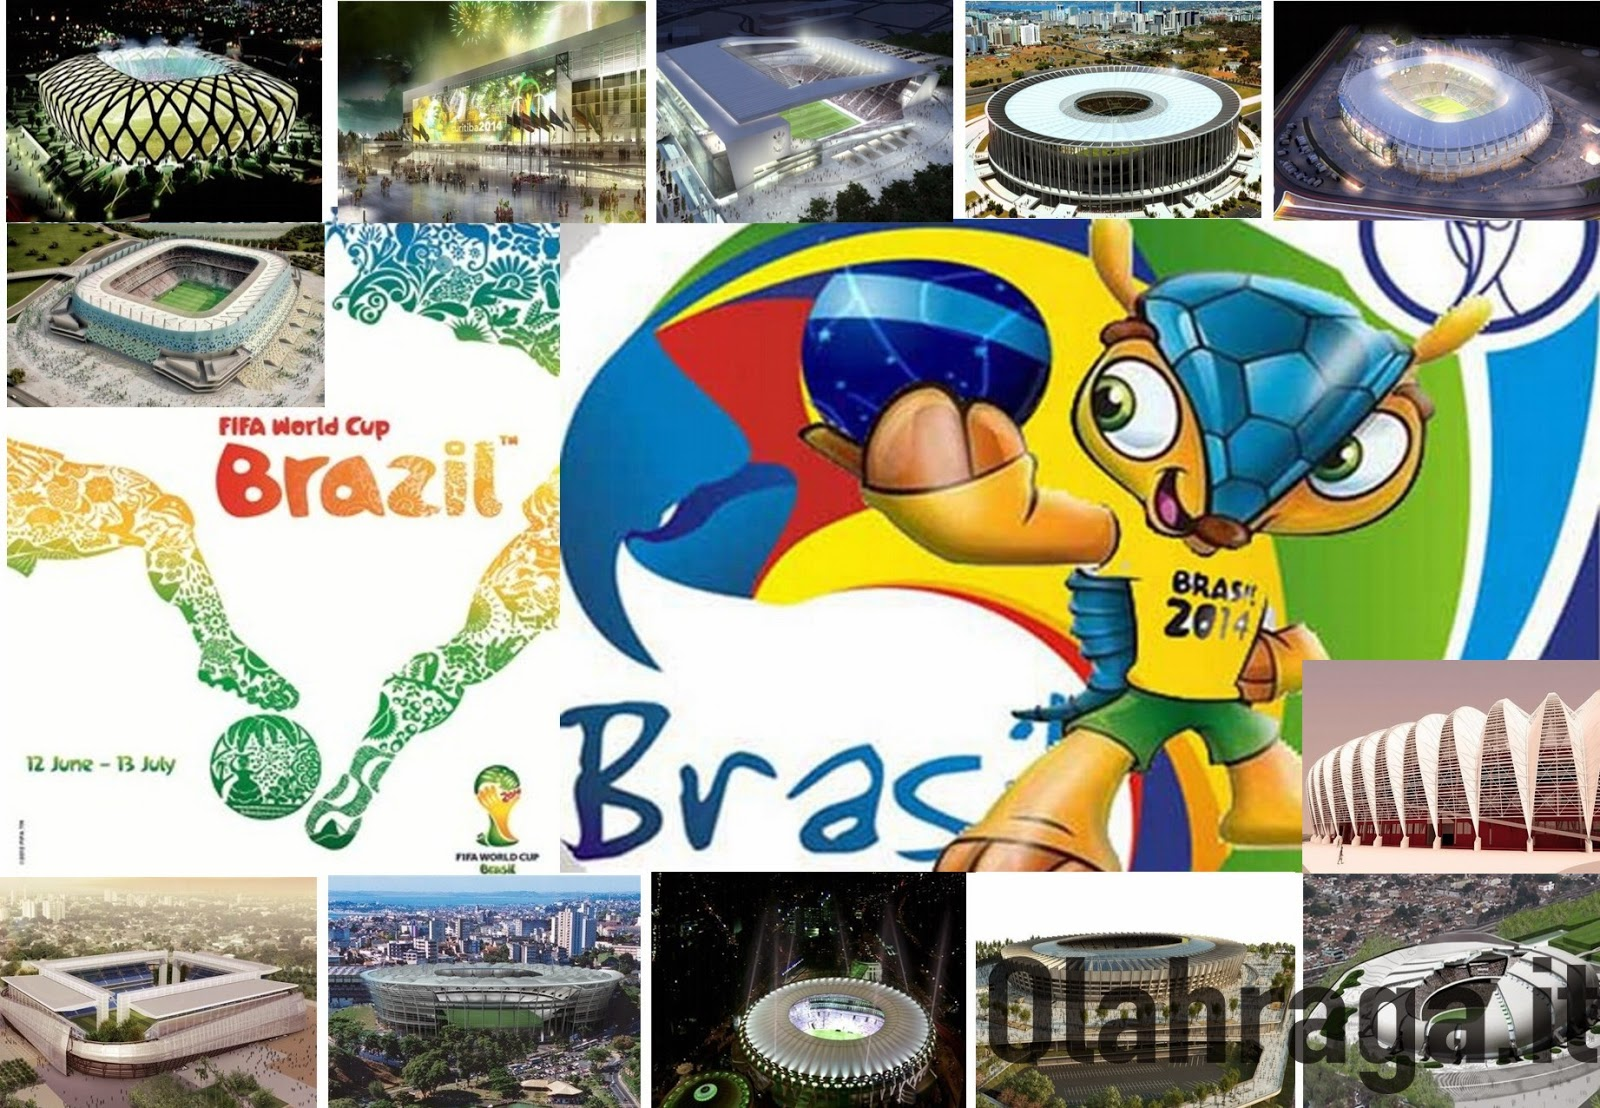 Olahraga.it - Piala Dunia 2014 yang akan diselenggarakan di Brasil nampaknya tak kalah meriah dari PD Afrika Selatan 2010, terutama sarana stadion yang akan menjadi panggung para bintang sepakbola dunia. Ini Stadion Piala Dunia 2014 Brasil yang sudah dipersiapkan jauh-jauh hari.